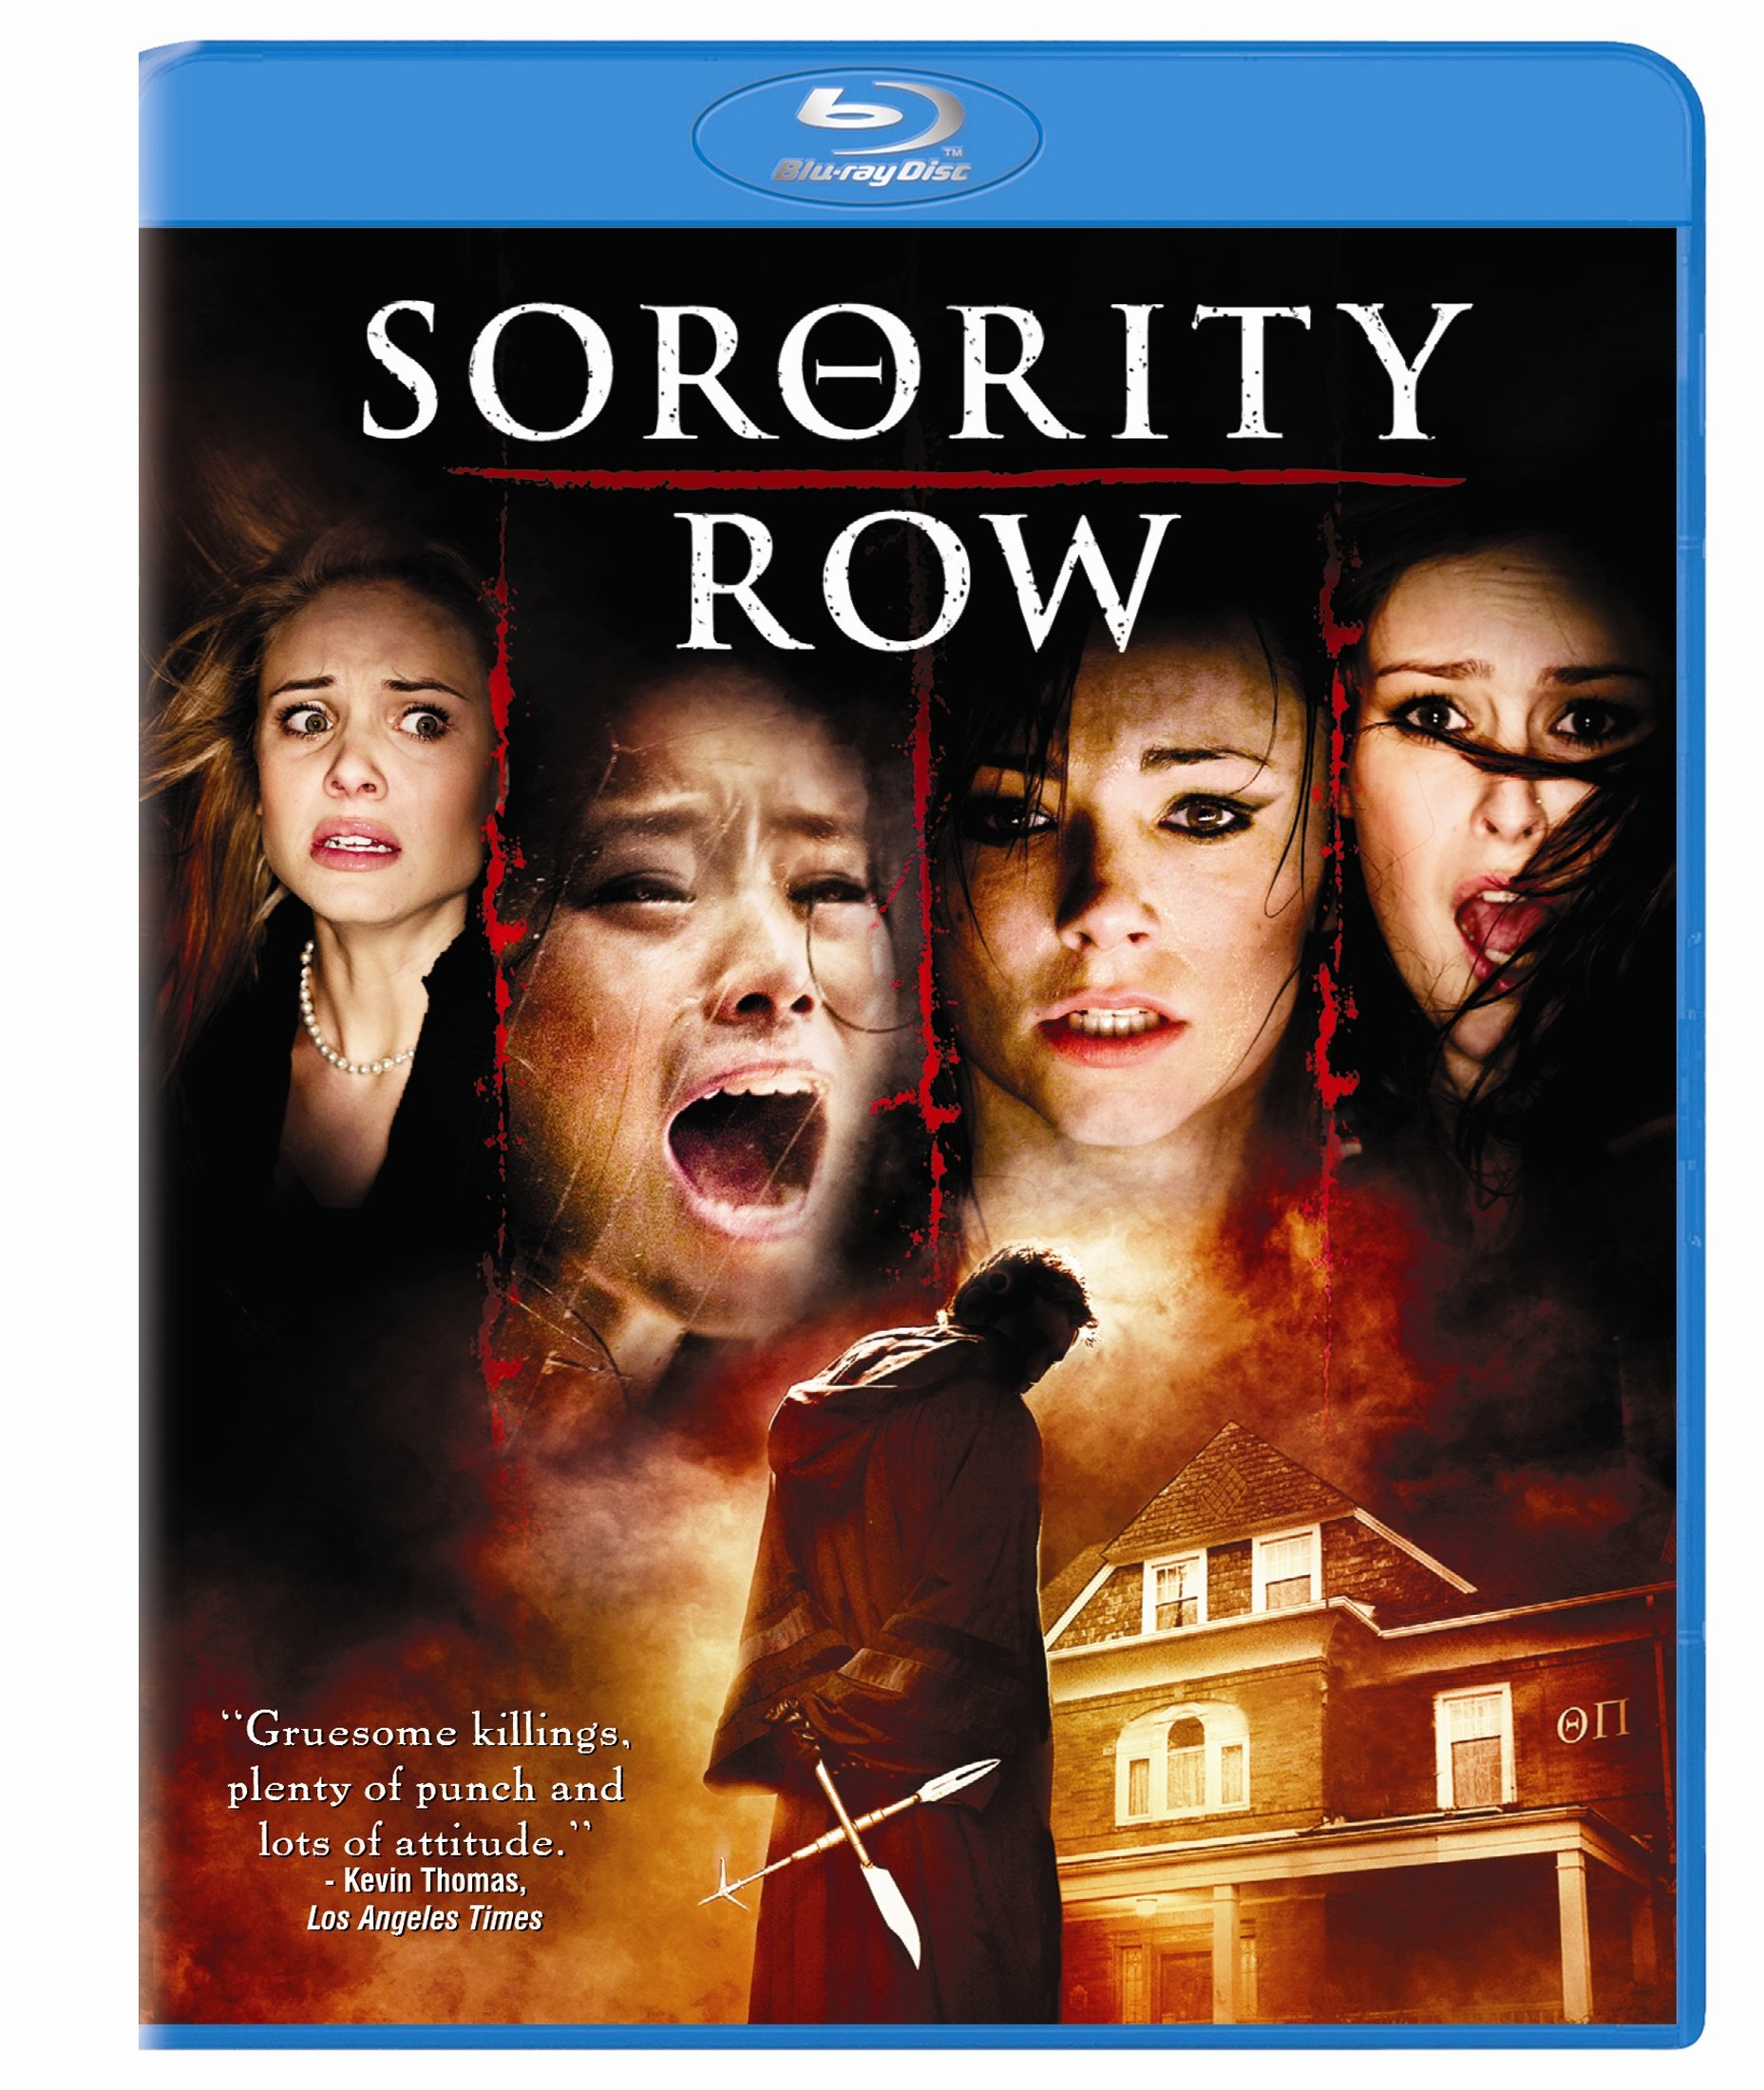 Blu-ray : Sorority Row (, Dolby, AC-3, Digital Theater System, Widescreen)